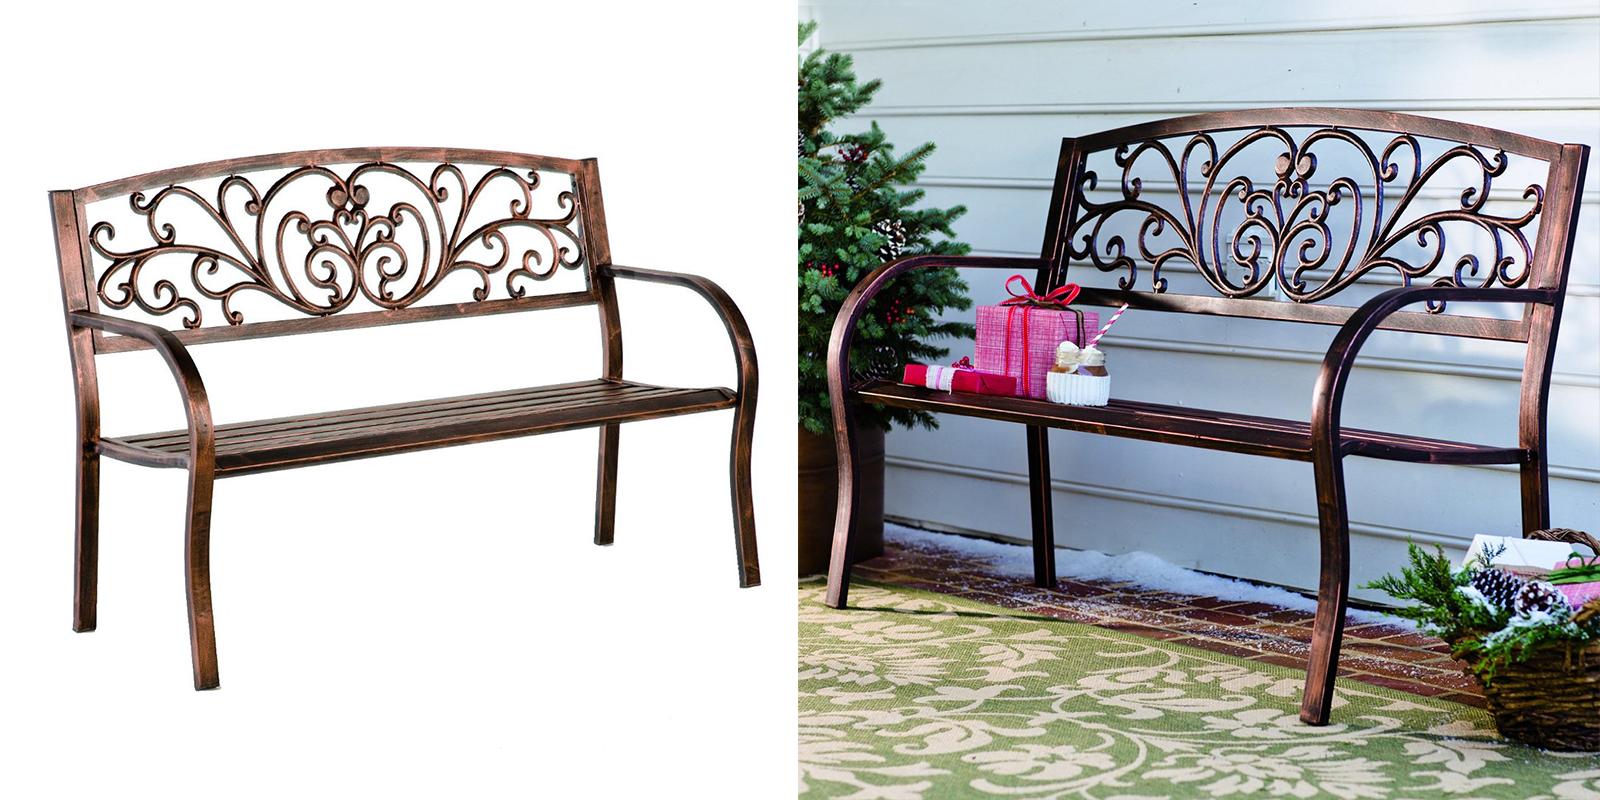 Patio Chair - Bronze Finish Blooming Garden Bench